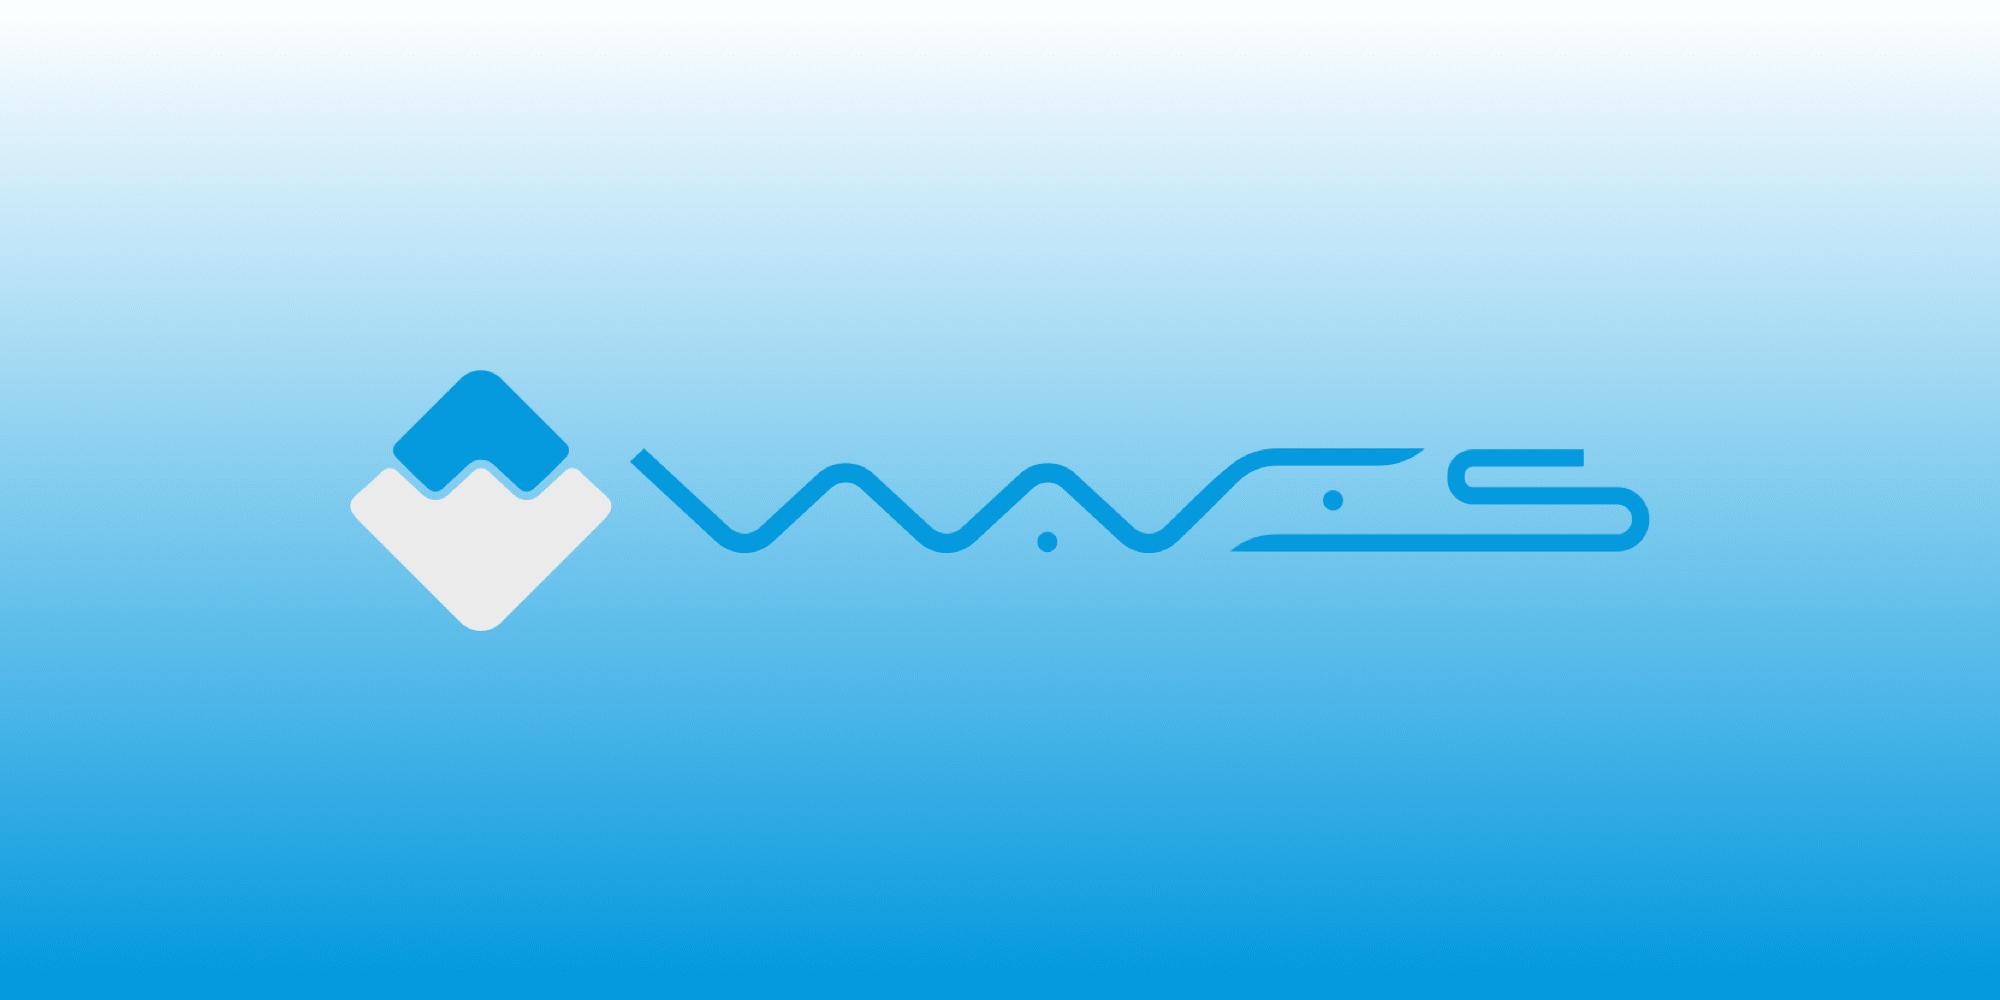 waves price bitcointalk